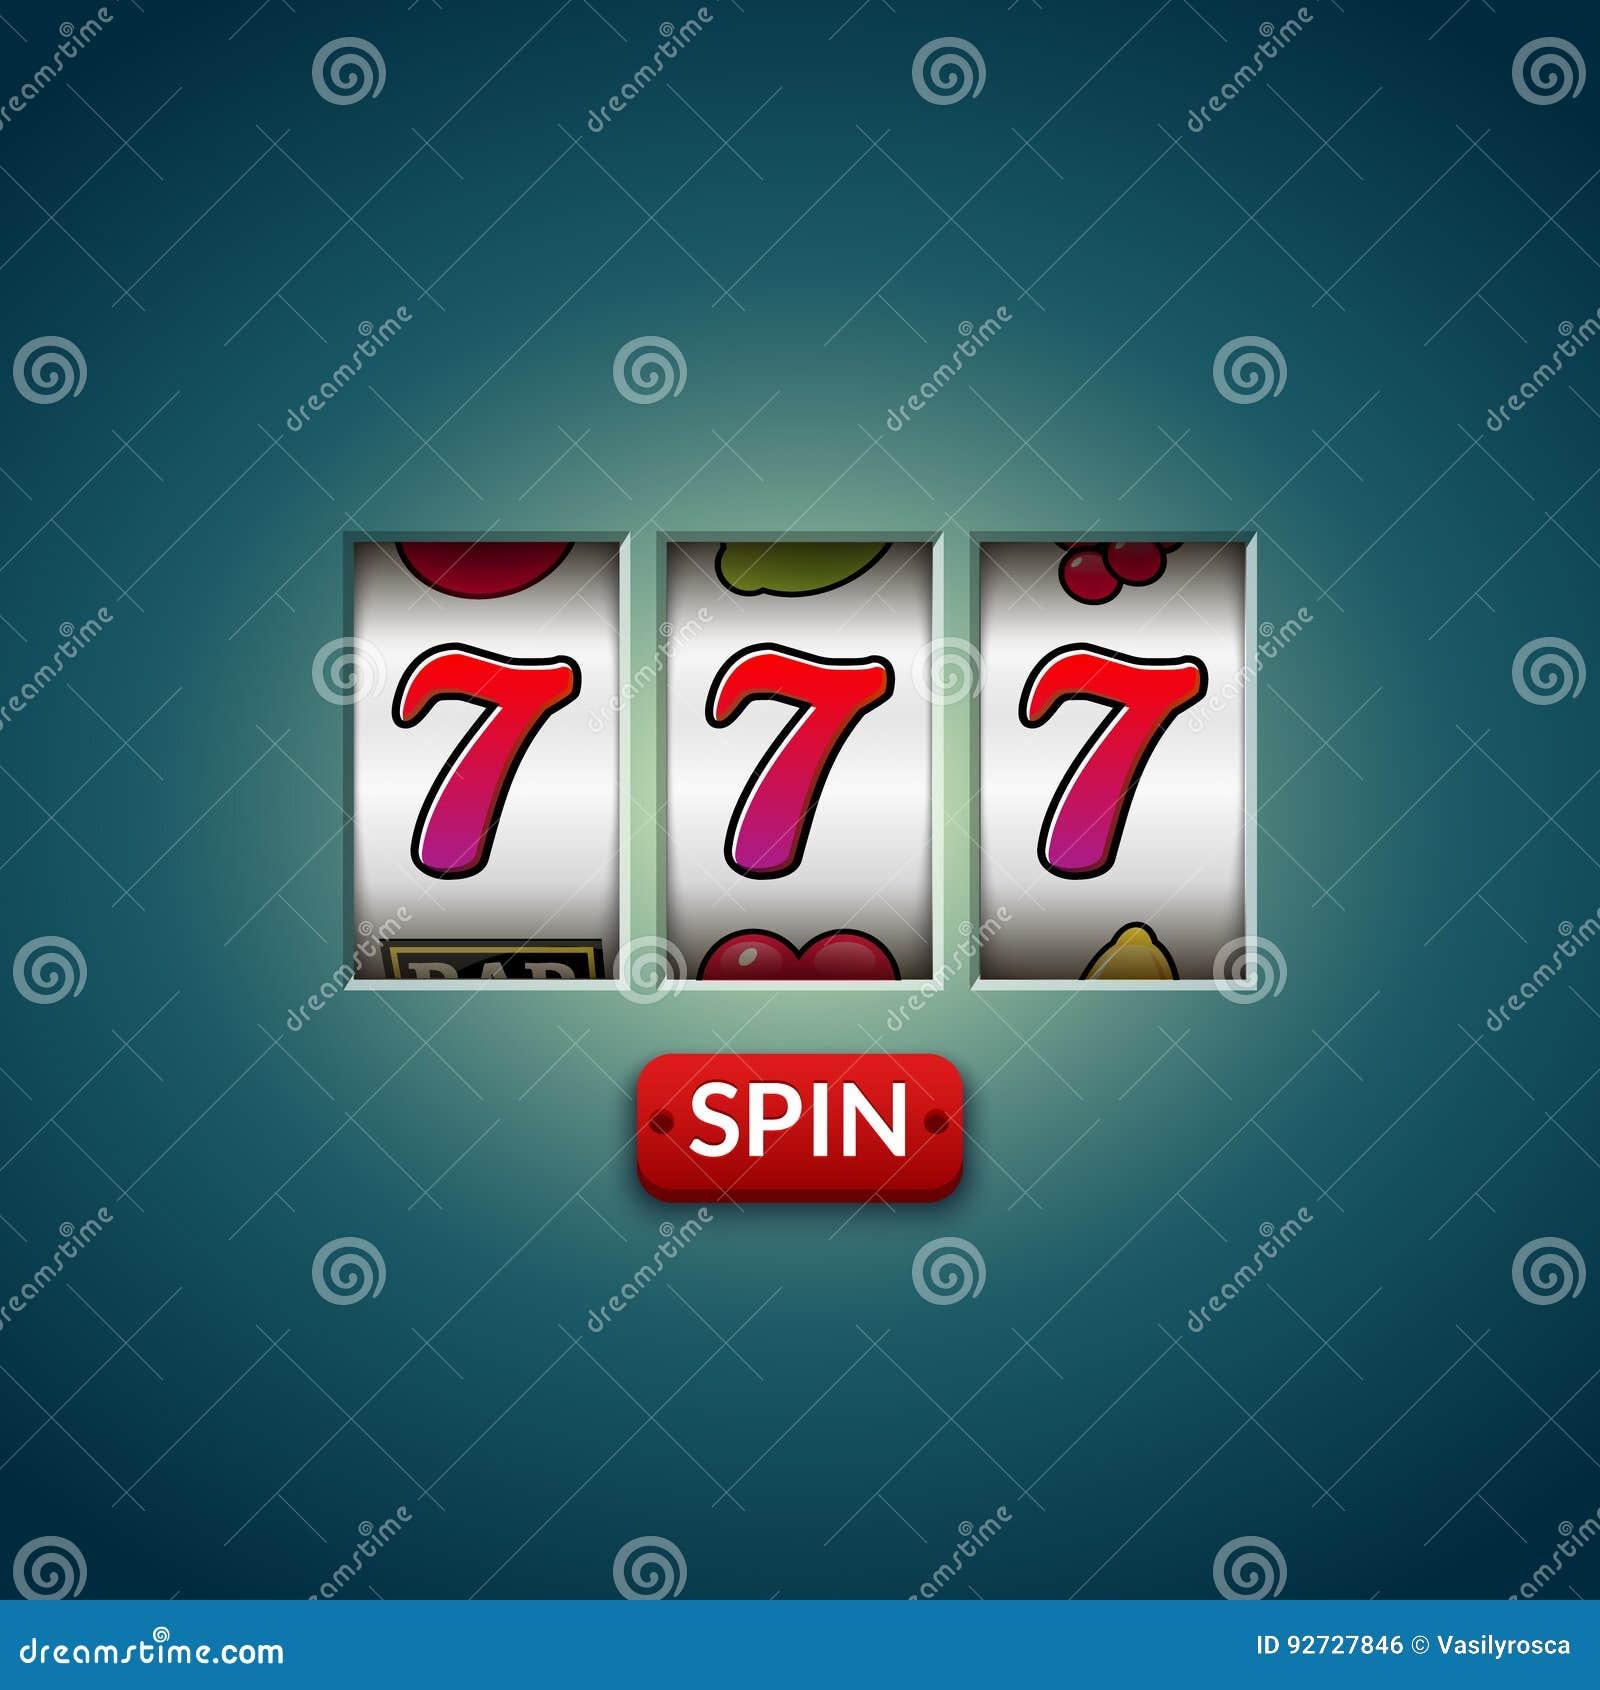 Lucky seven 777 slot machine. Casino vegas game. Gambling fortune chance. Win jackpot money